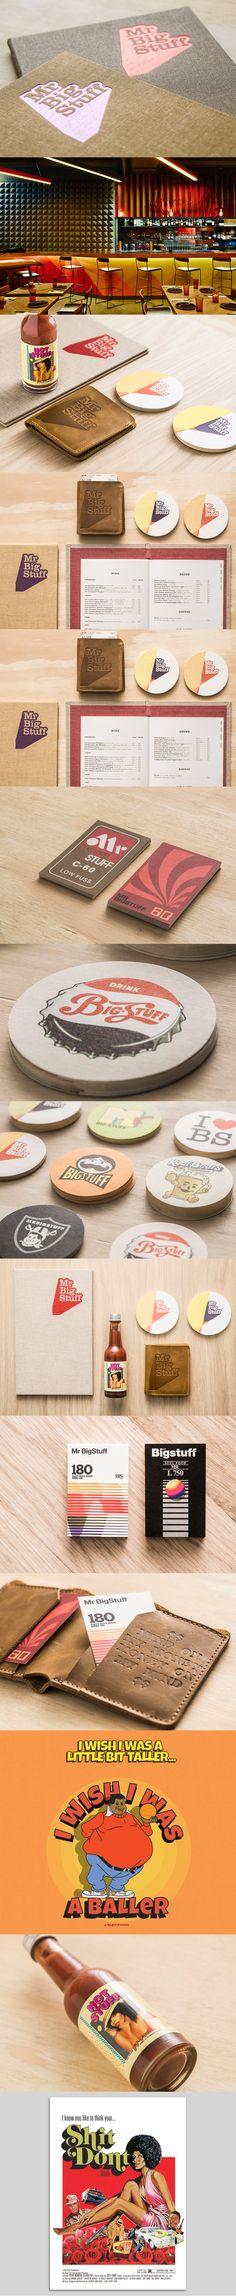 Mr Big Stuff brand by Can I Play Corporate Identity, Visual Identity, Brand Identity, Graphic Design Branding, Logo Branding, Mr Big, Brand Guidelines, Of Brand, Creative Logo